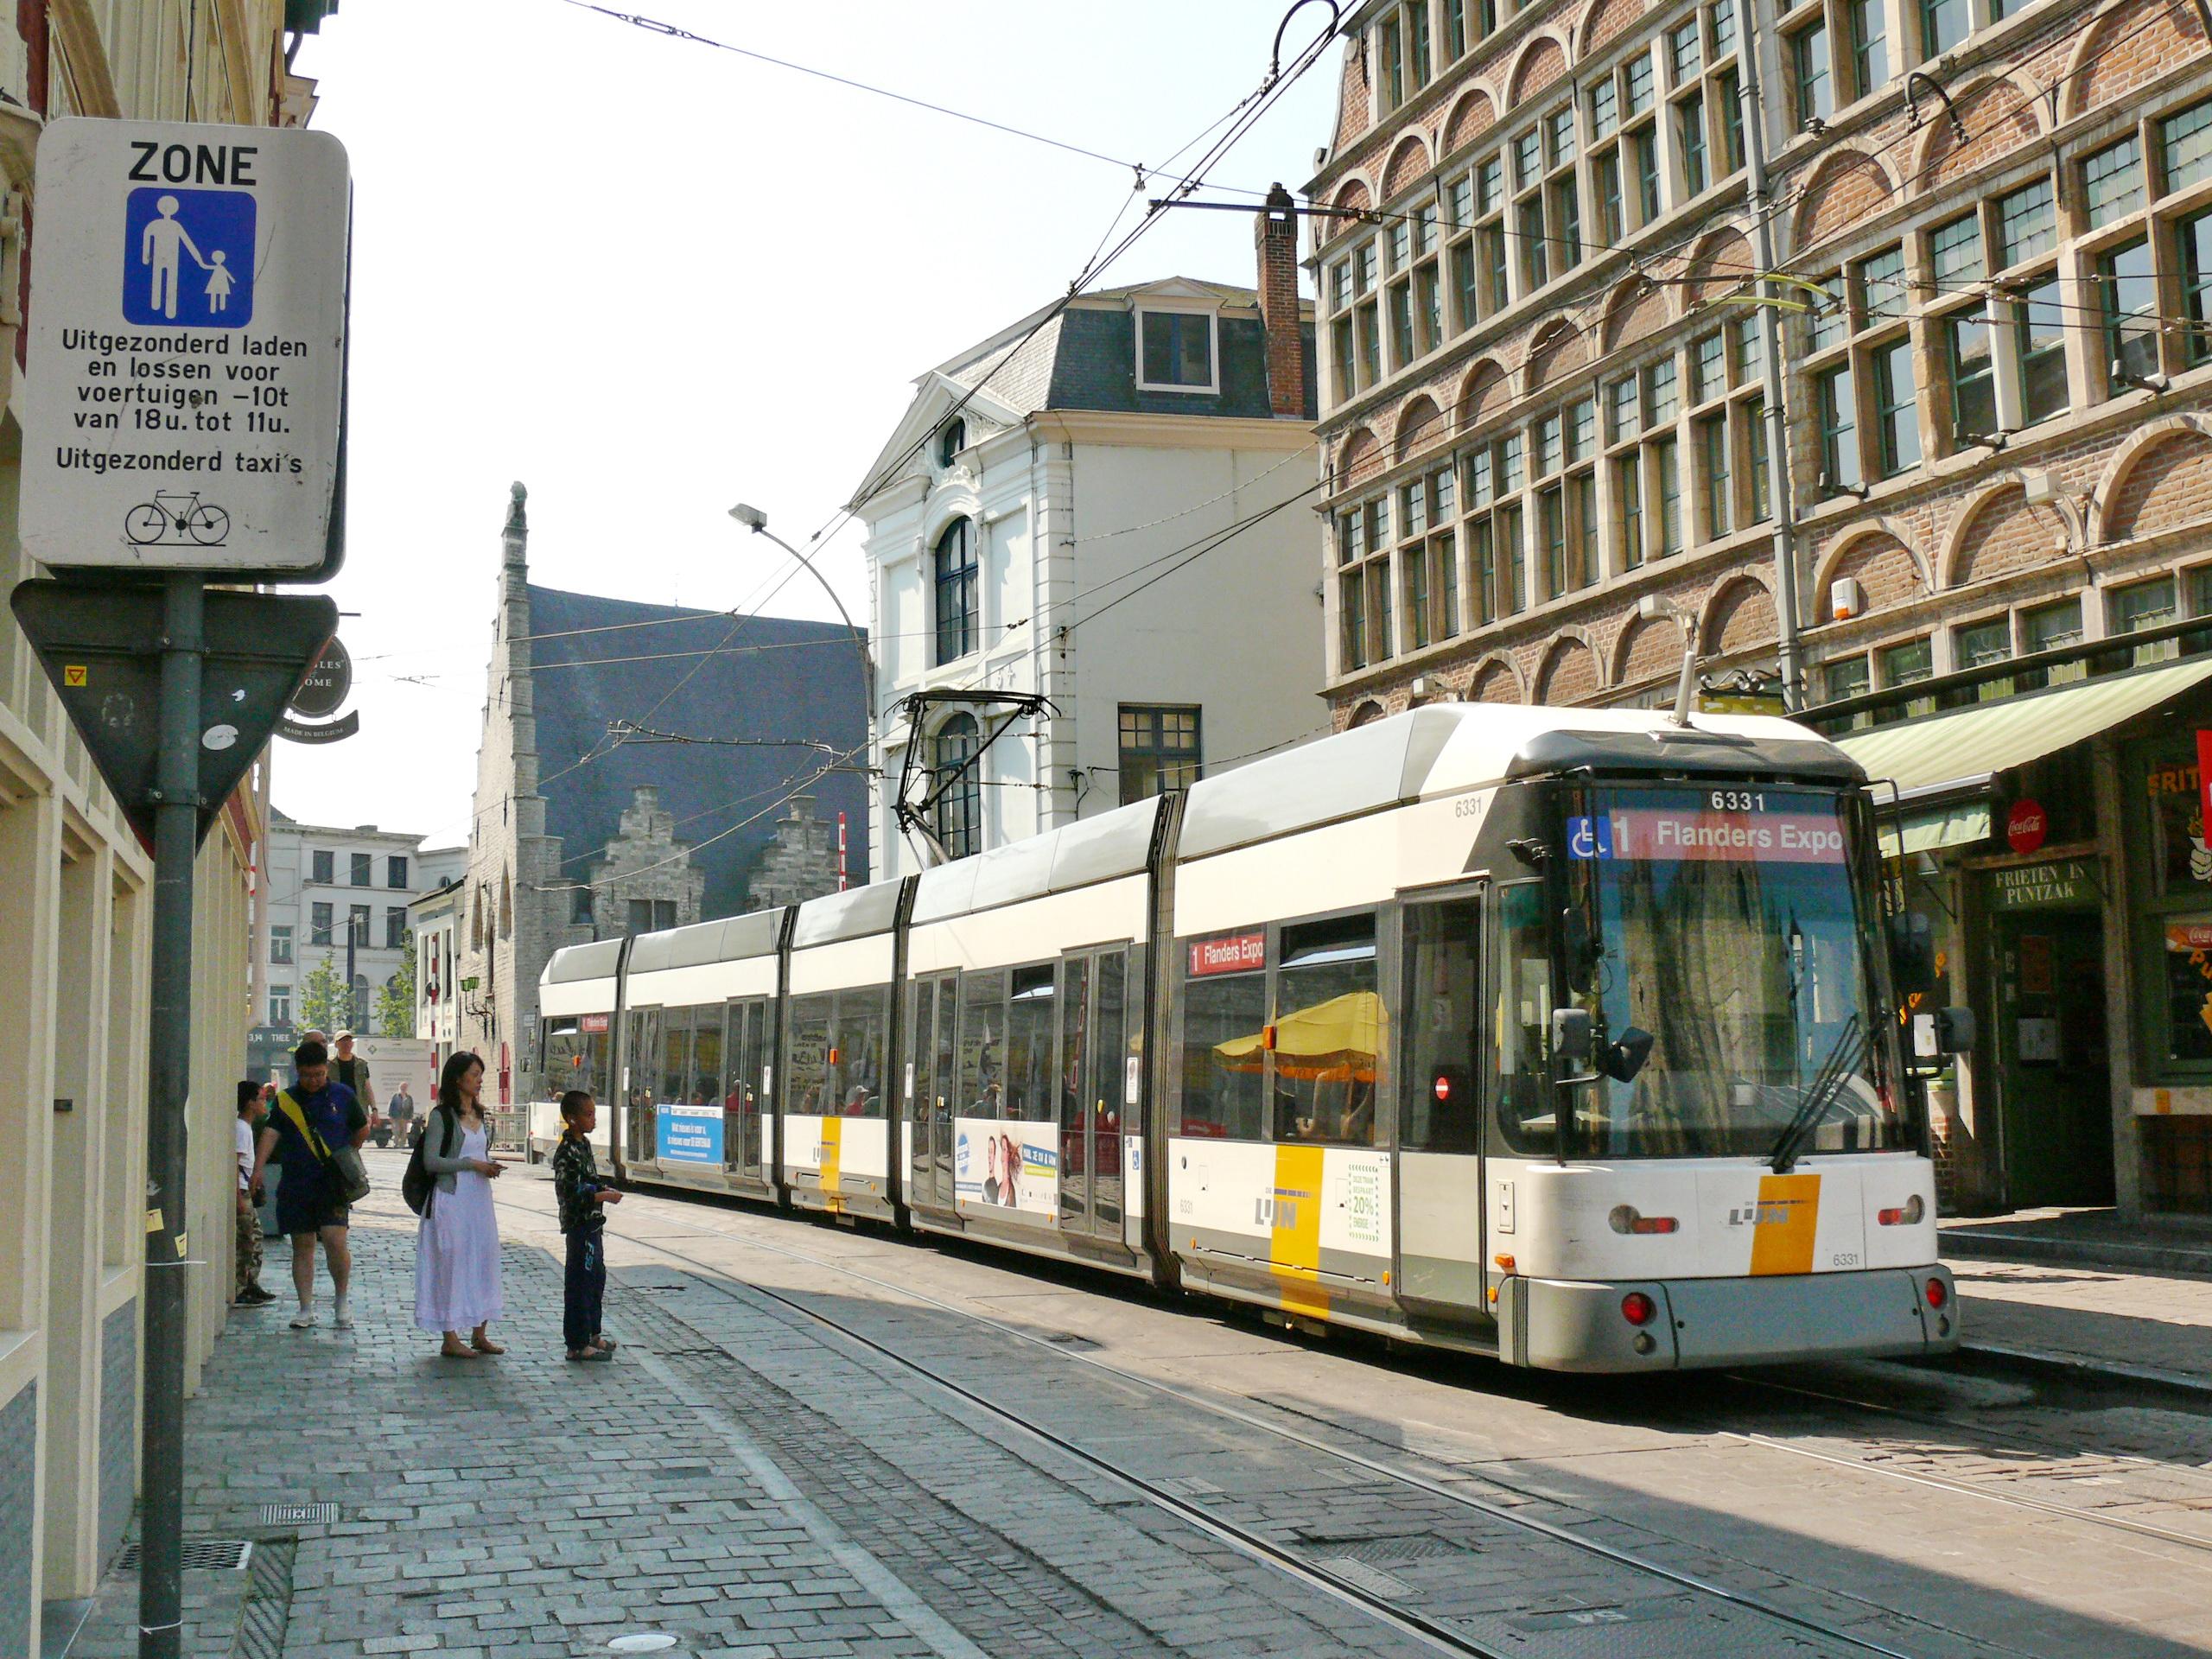 https://upload.wikimedia.org/wikipedia/commons/9/93/Tramway_de_Gand_-_Rame_6331_Hermelijn_%C3%A0_Rekelingestraat.JPG